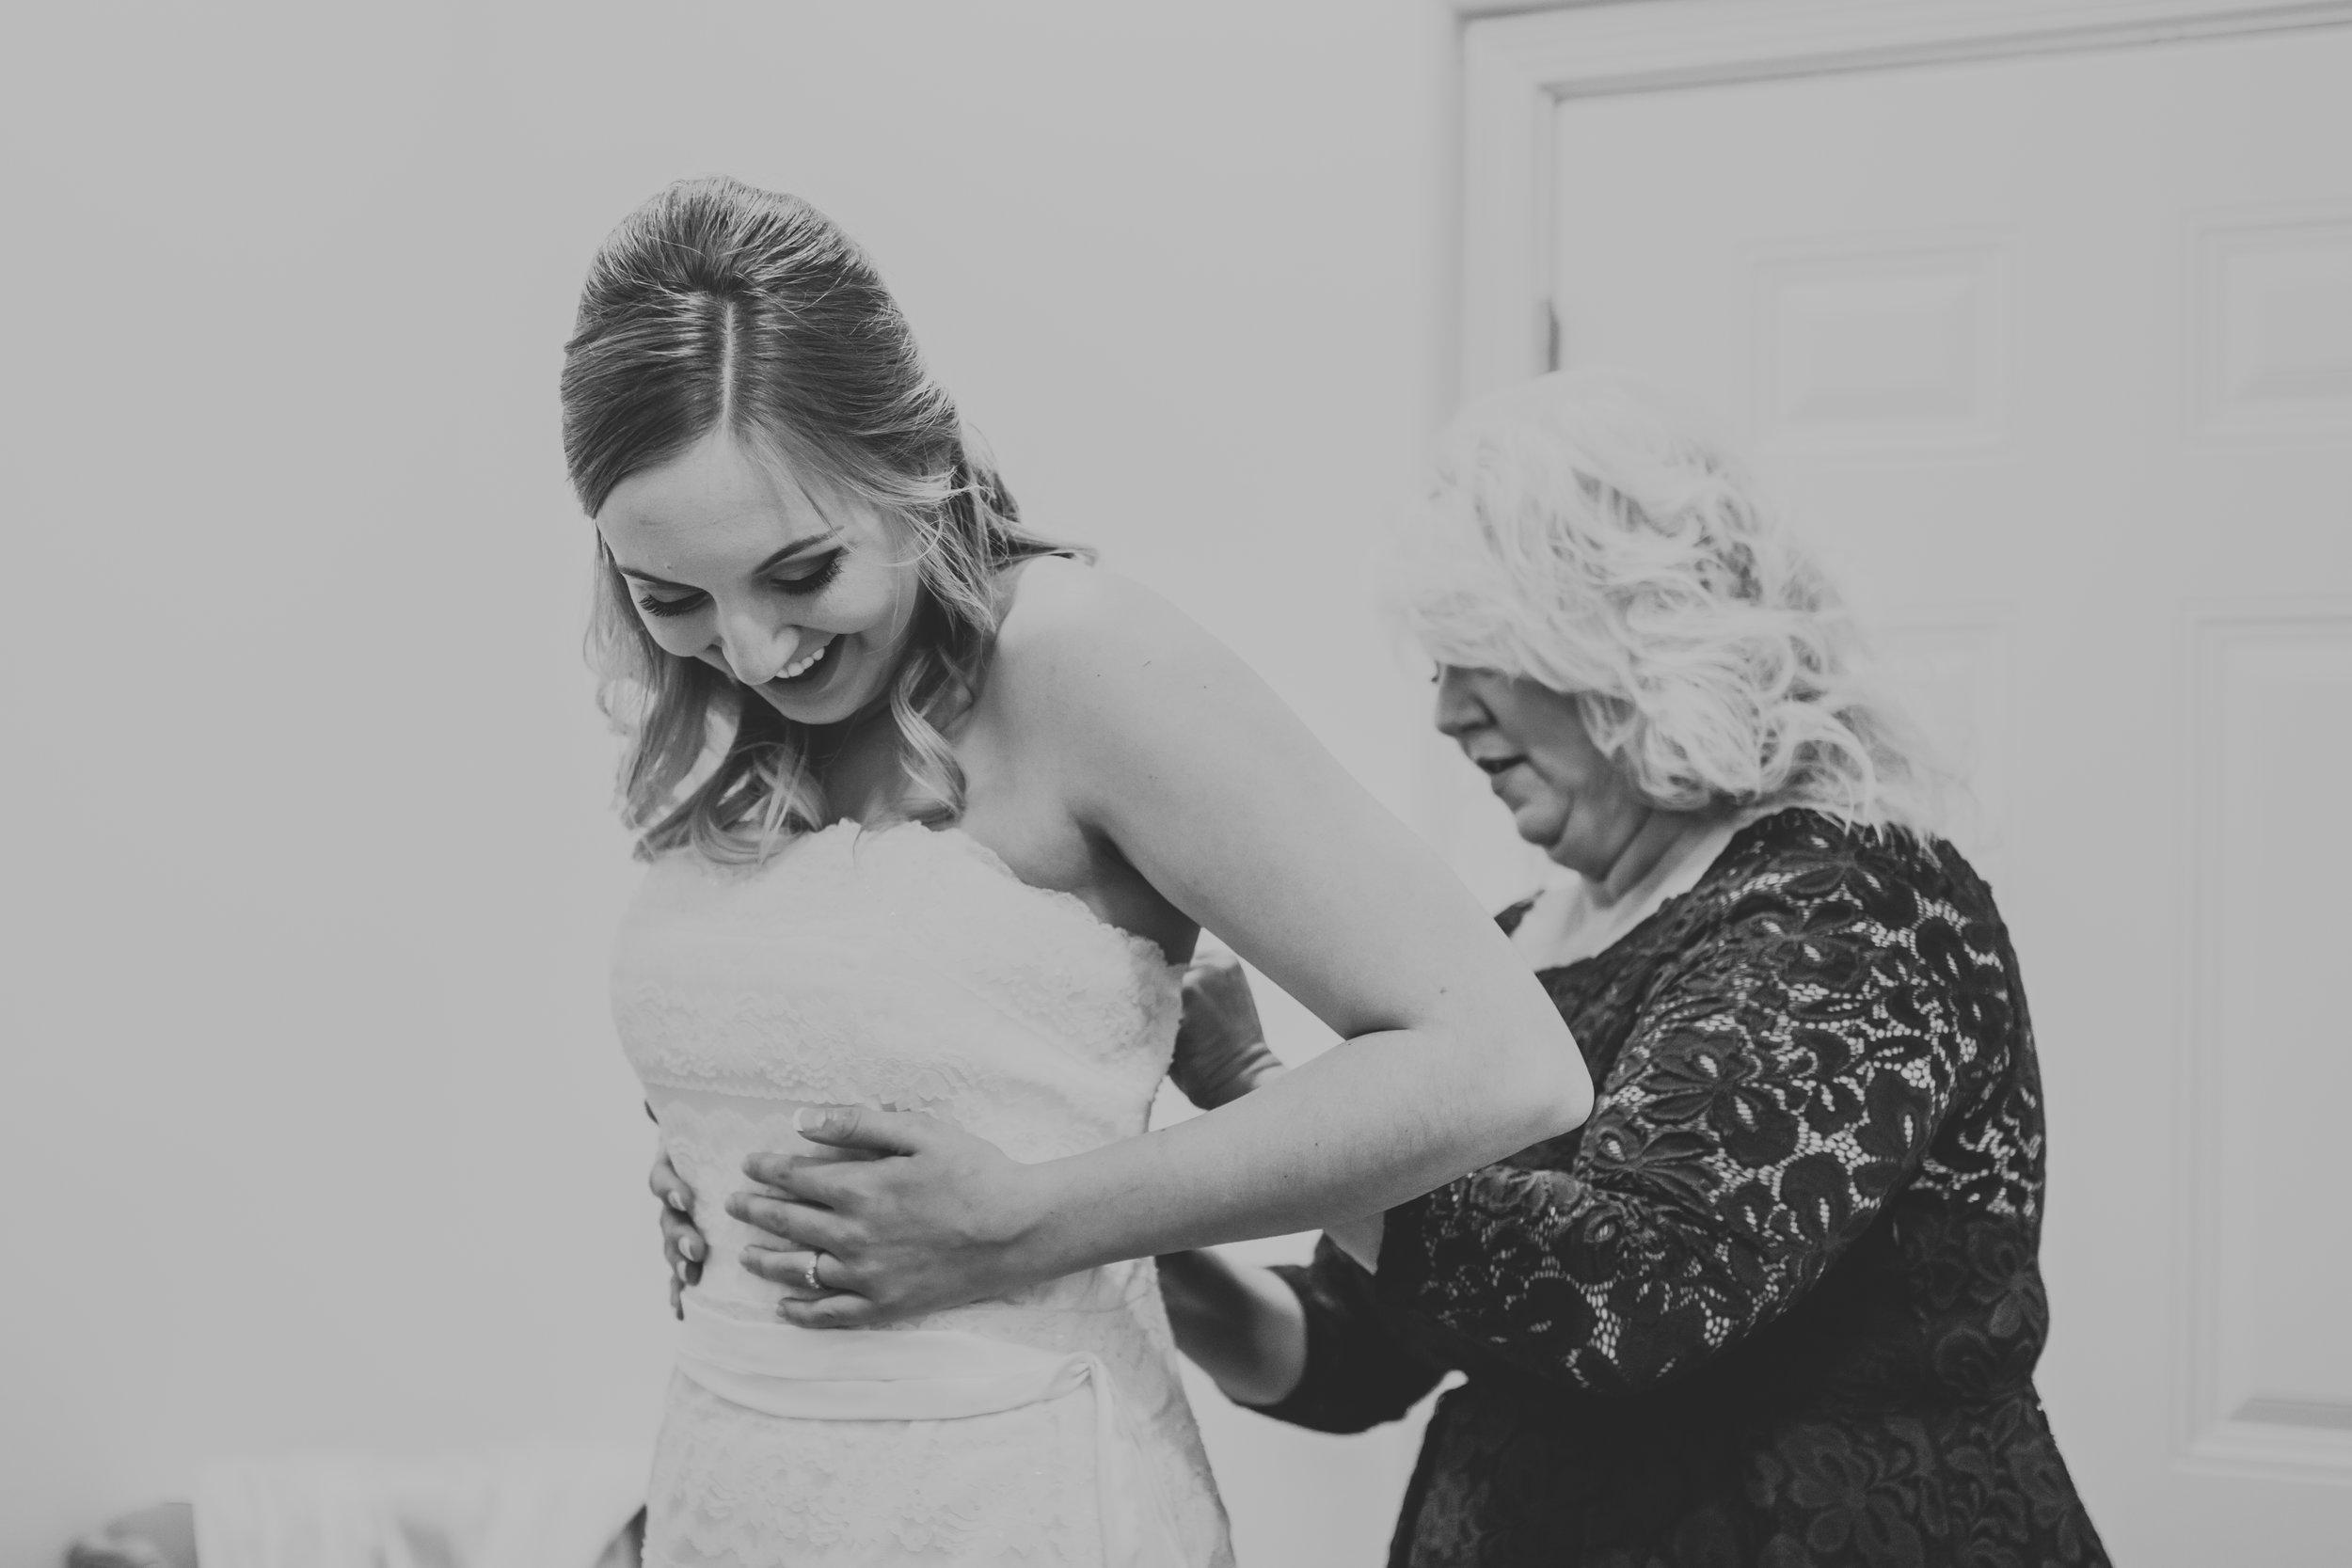 Jassan + Christine   El Paso Wedding   Los Portales, New Mexico   Sparrow & Gold Photography   An El Paso Wedding Photographer